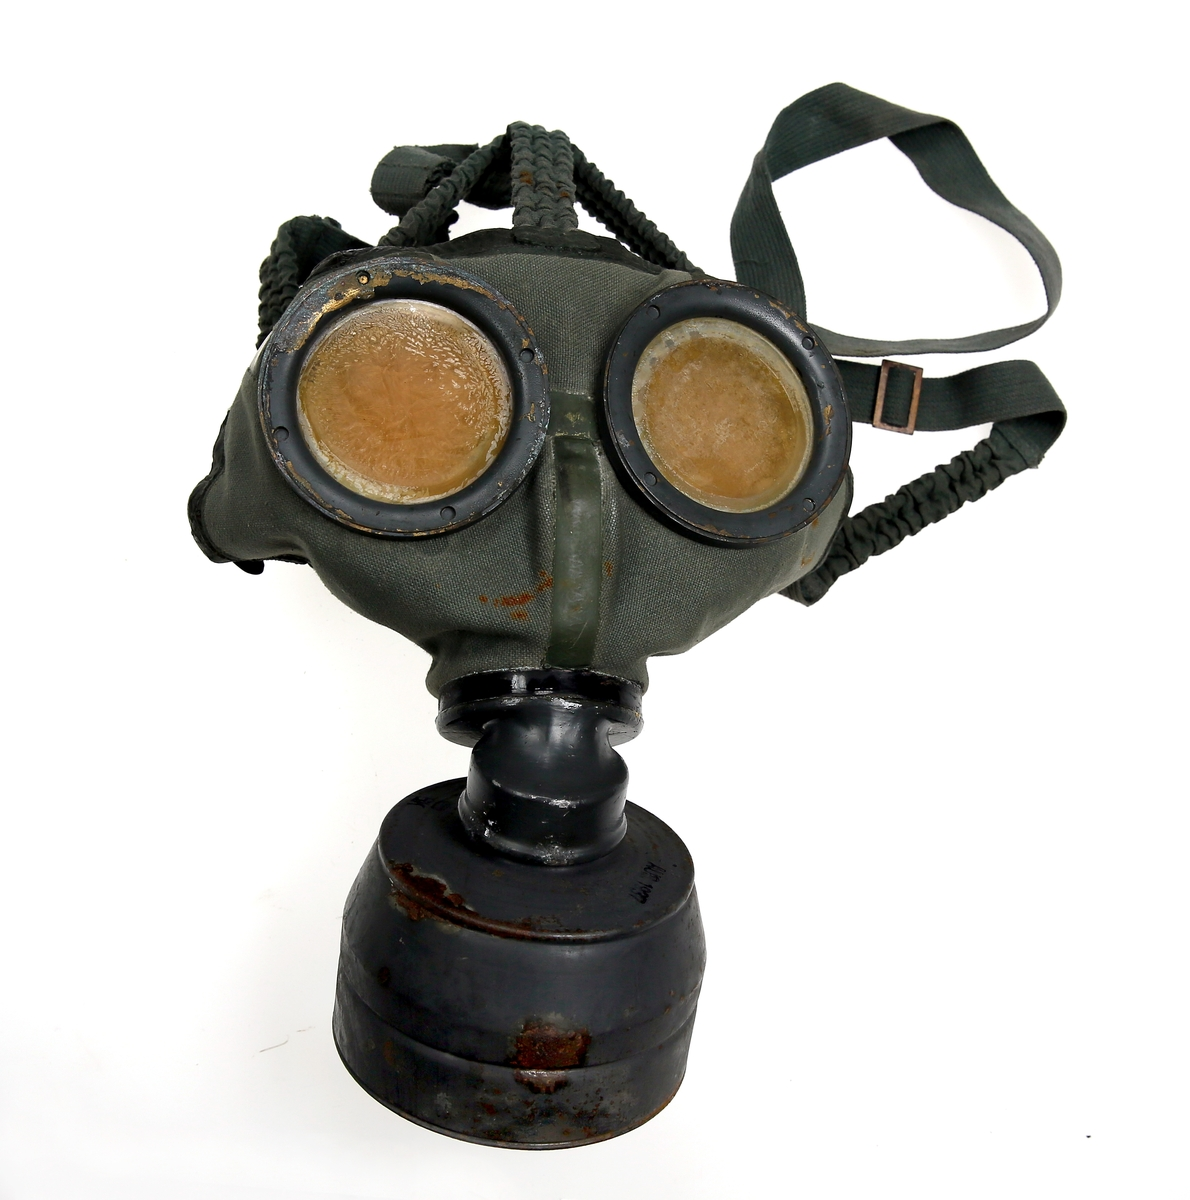 Tysk gassmaske GM30 fra andre verdenskrig.